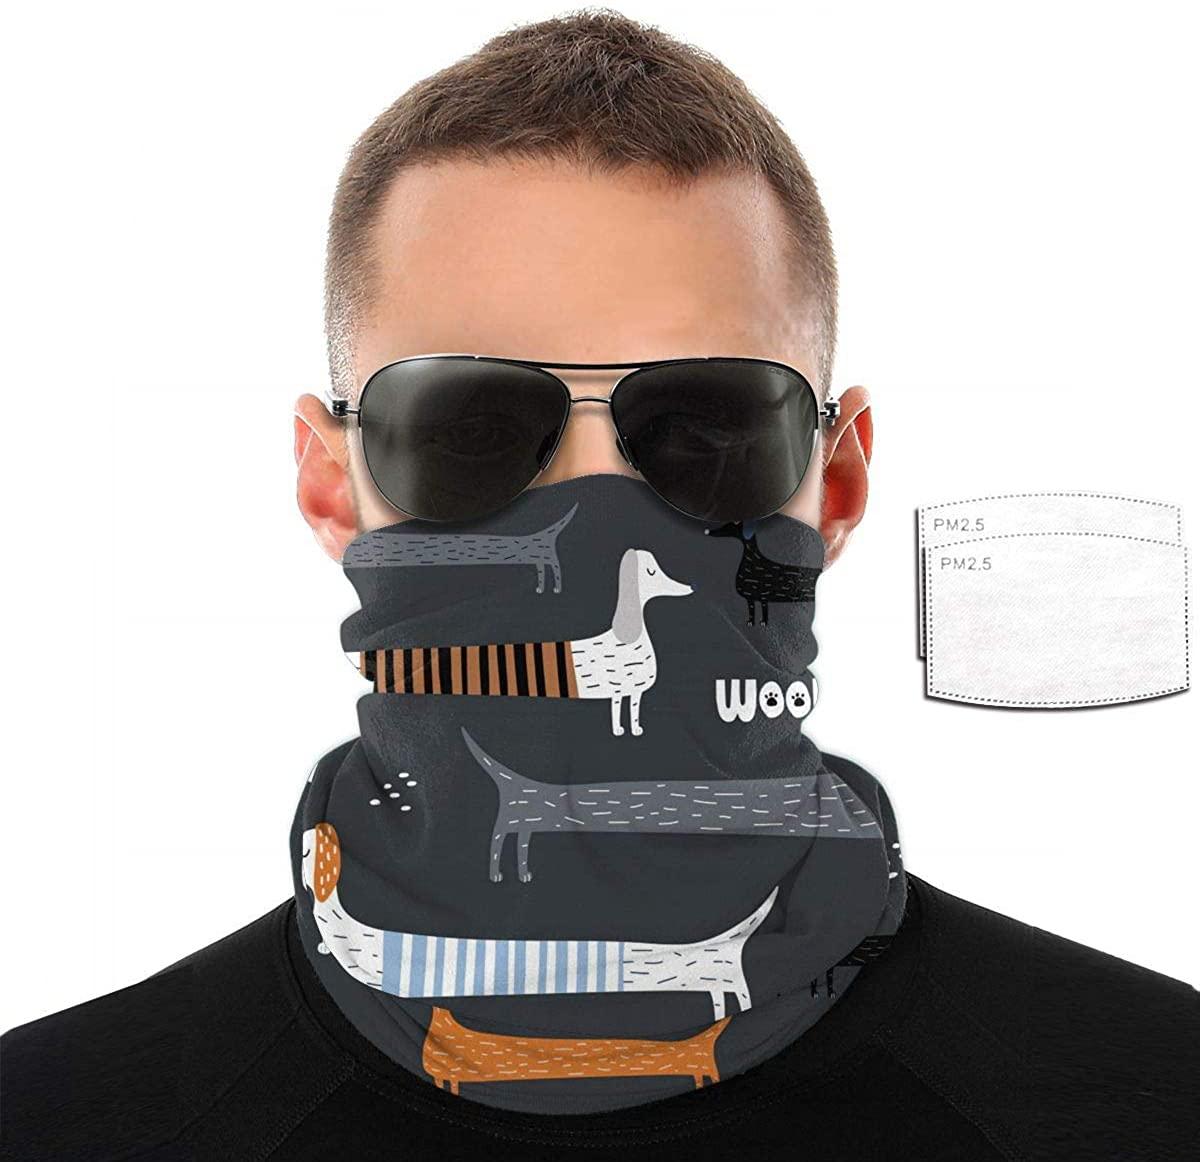 Variety Face Towel Earloop Pm2.5 Filter Print Dust Mask Bandana Half Bavaclava Headband Shield Scarf Pattern